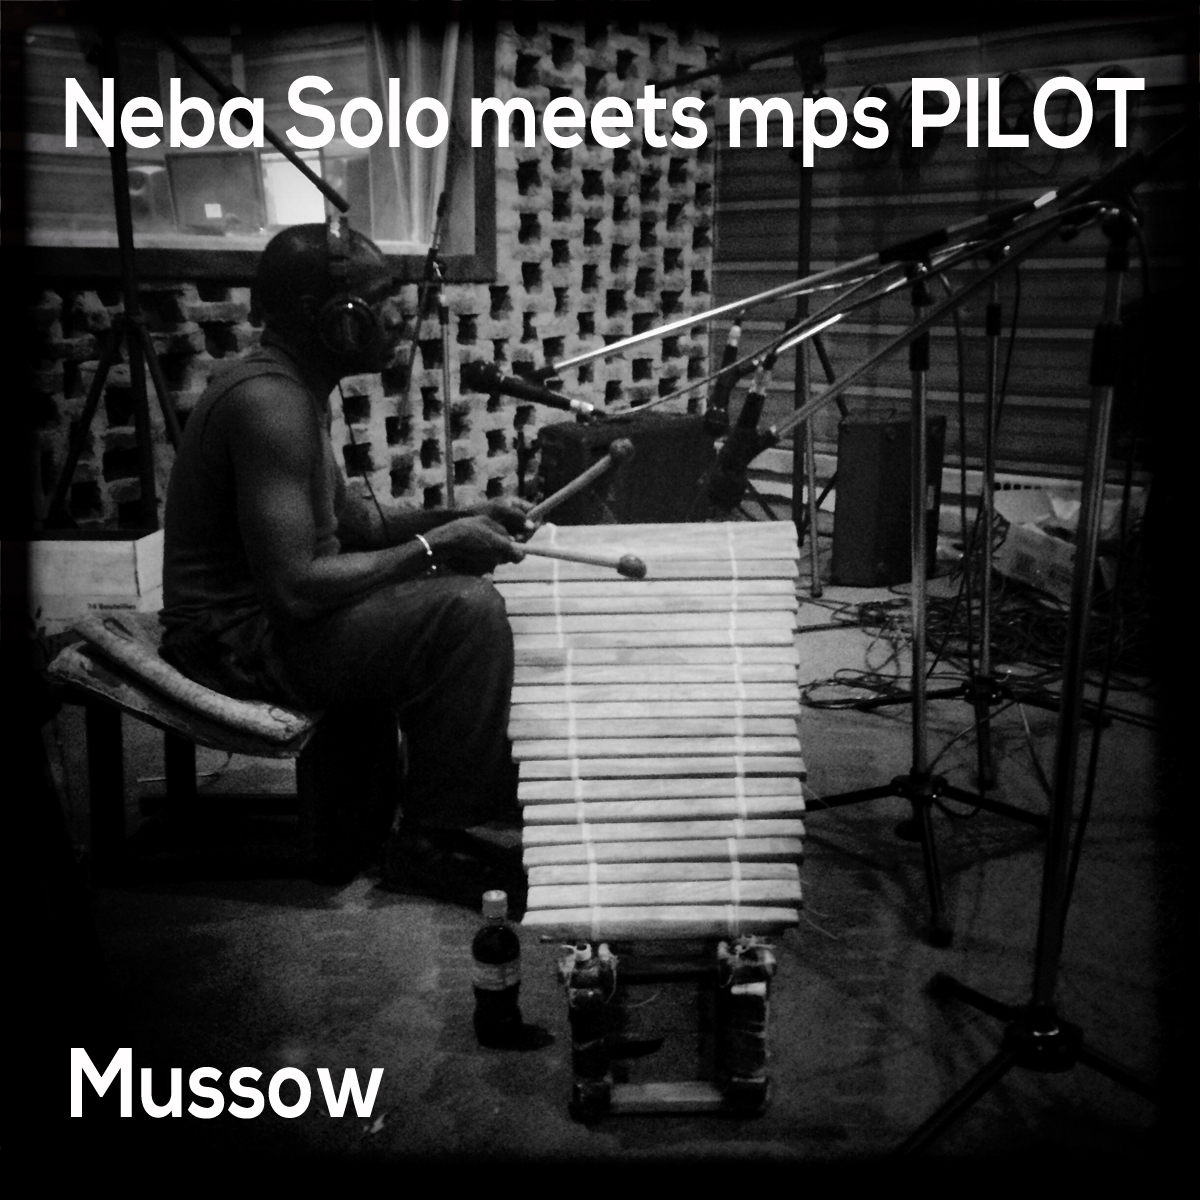 Neba Solo meets mps PILOT